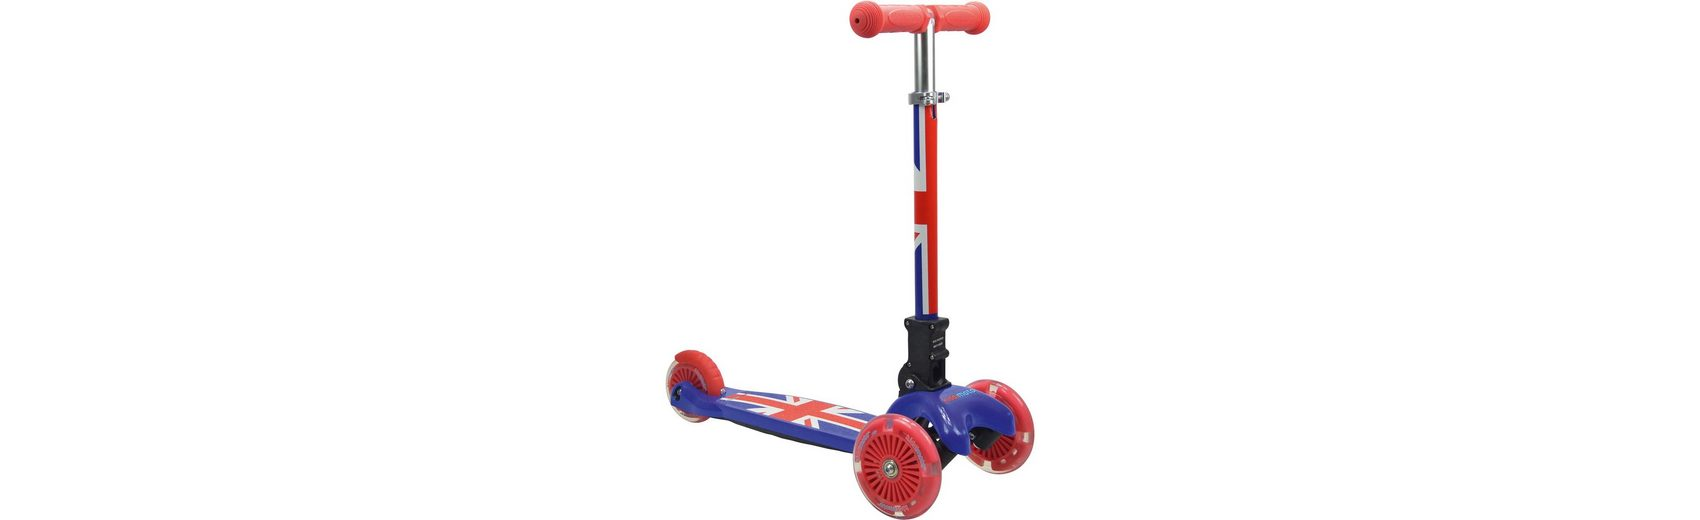 kiddimoto Scooter mit leuchtenden Rädern, Union Jack